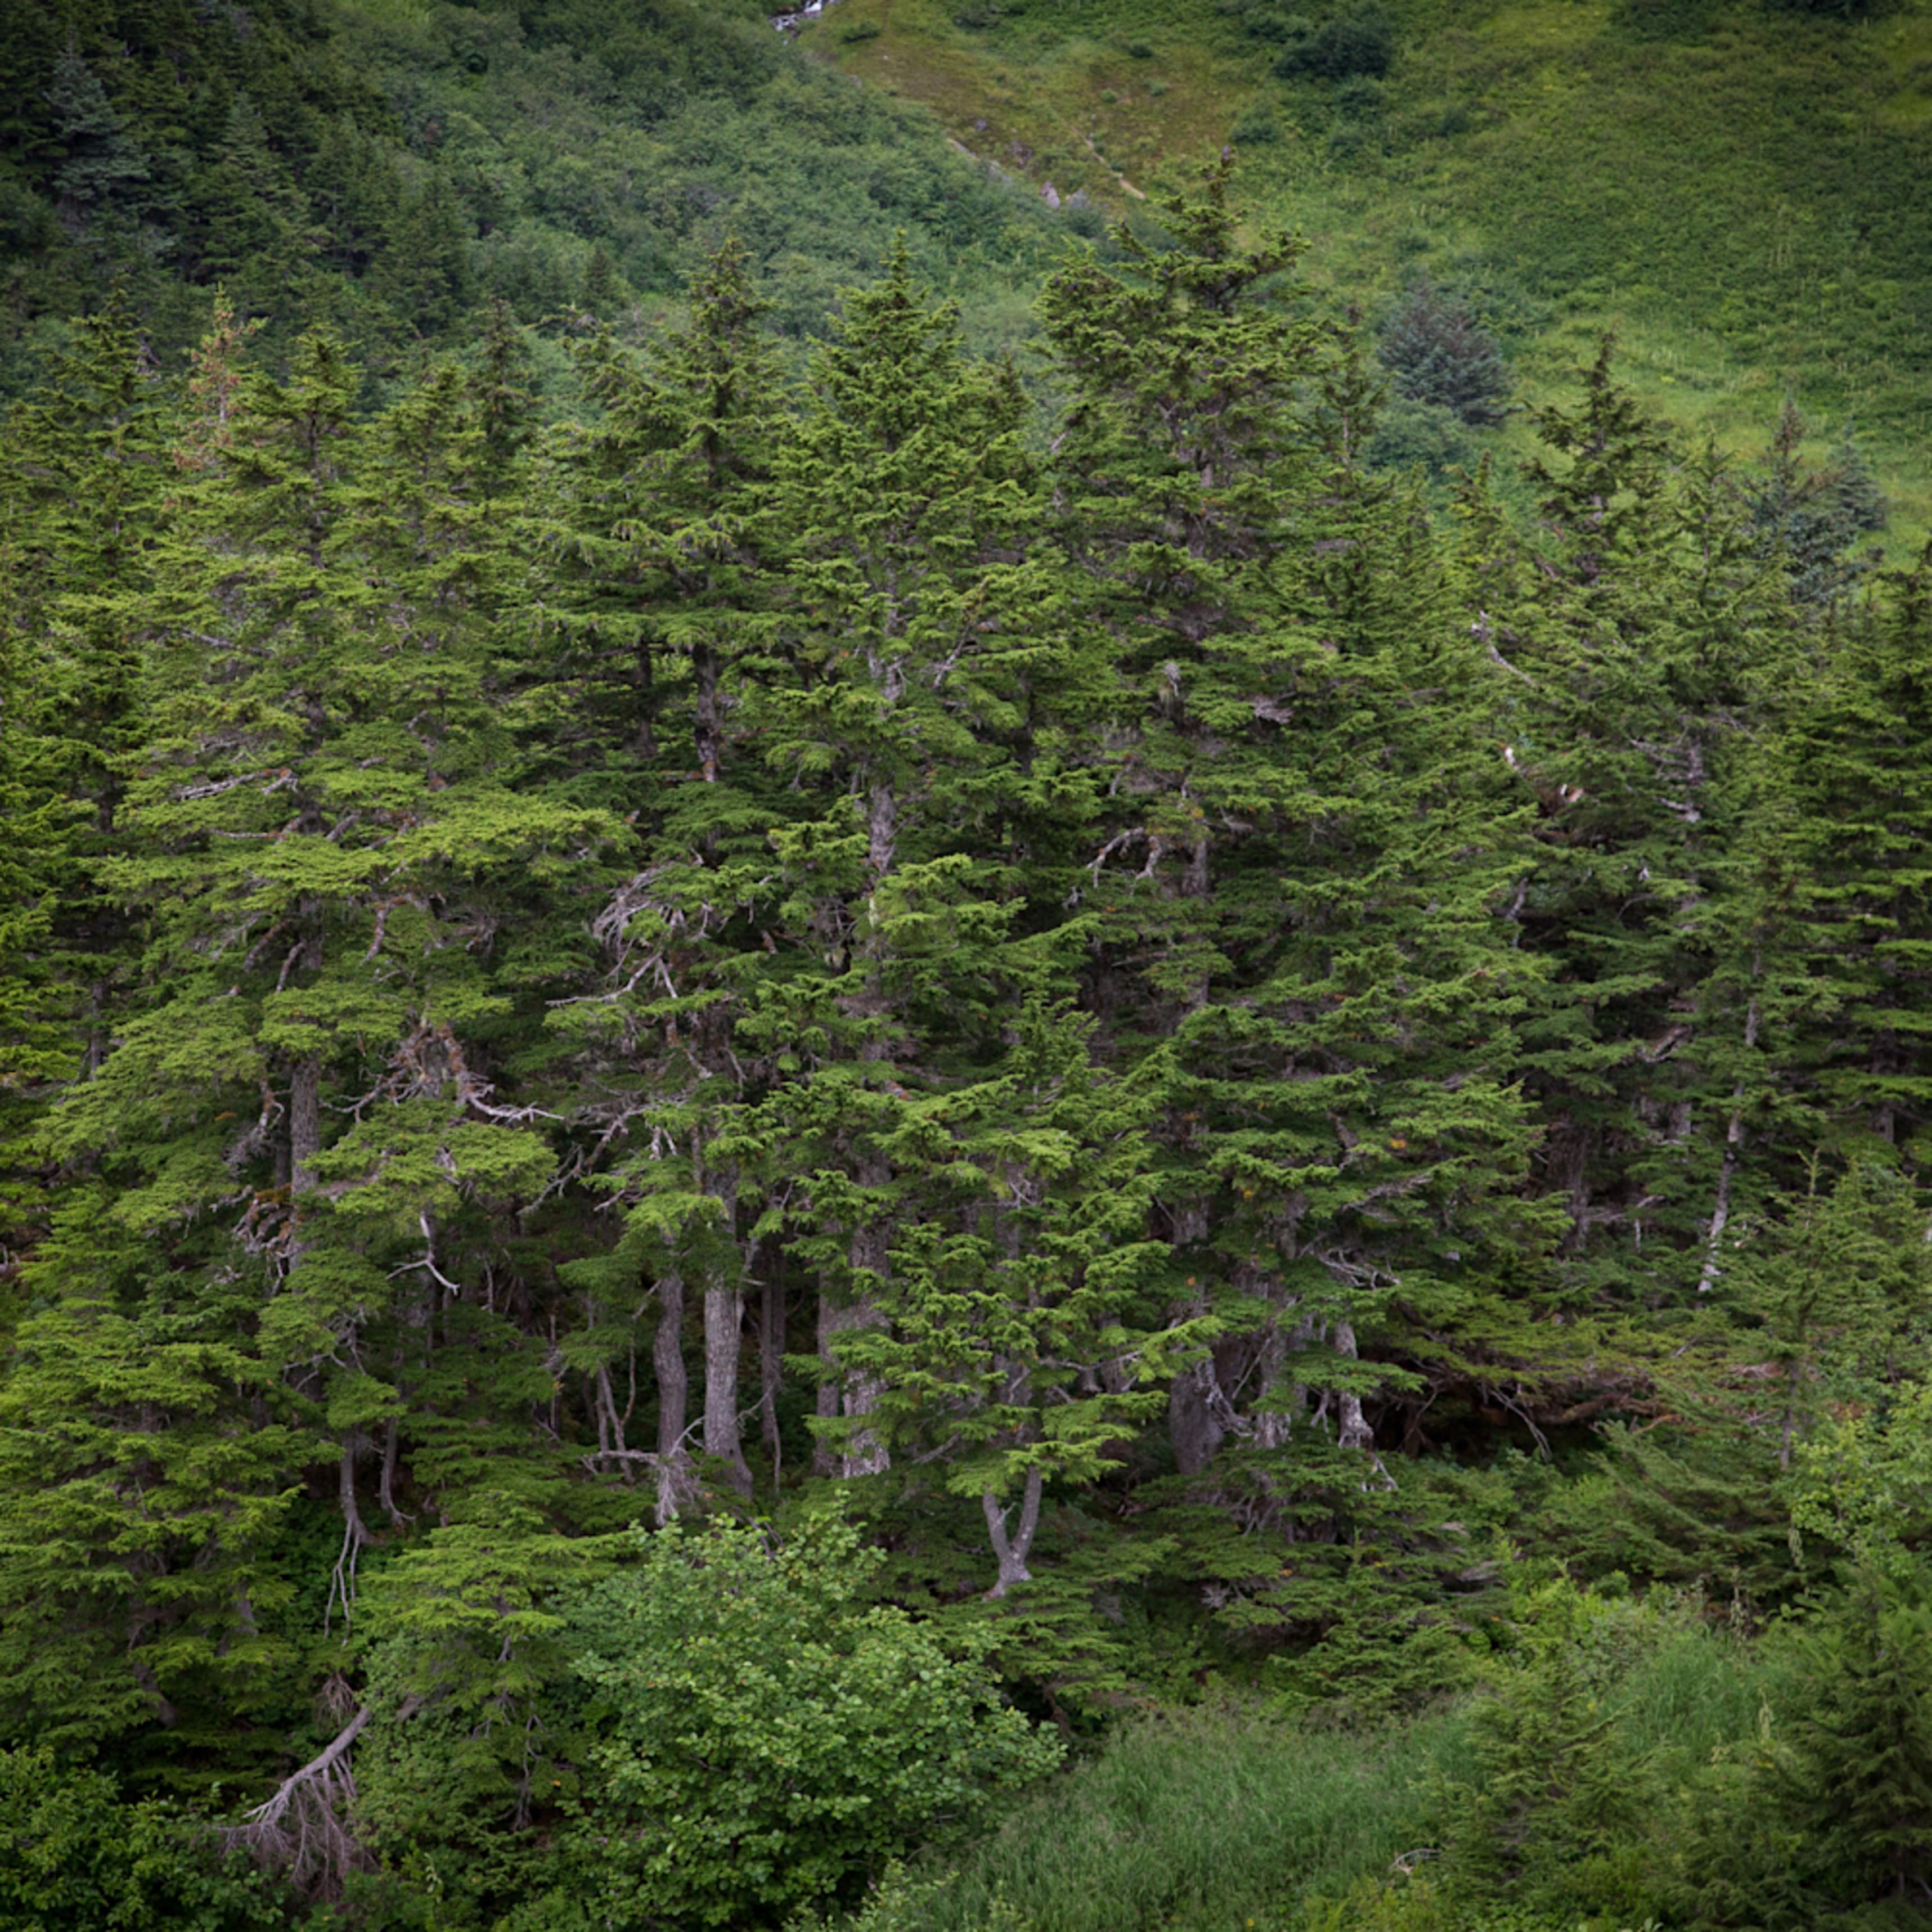 Fairytale forest evexsd